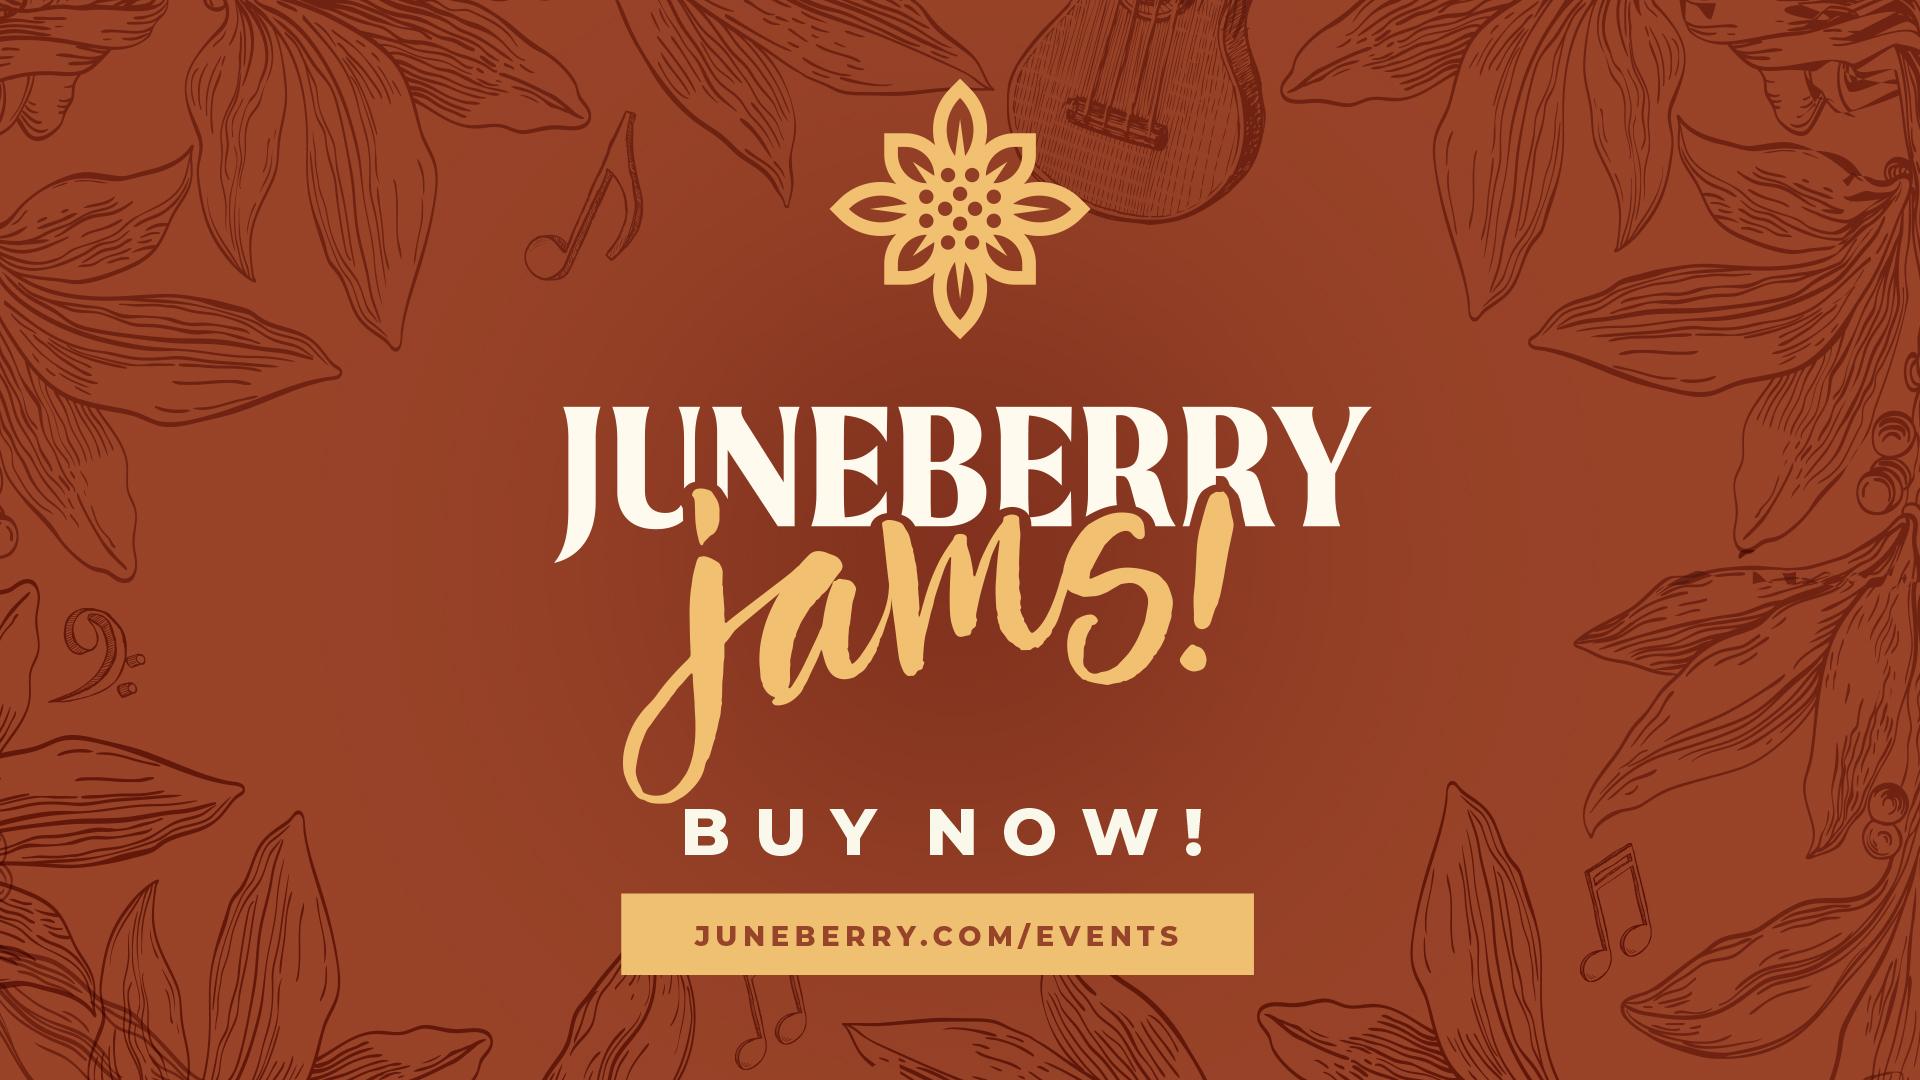 Juneberry Jams